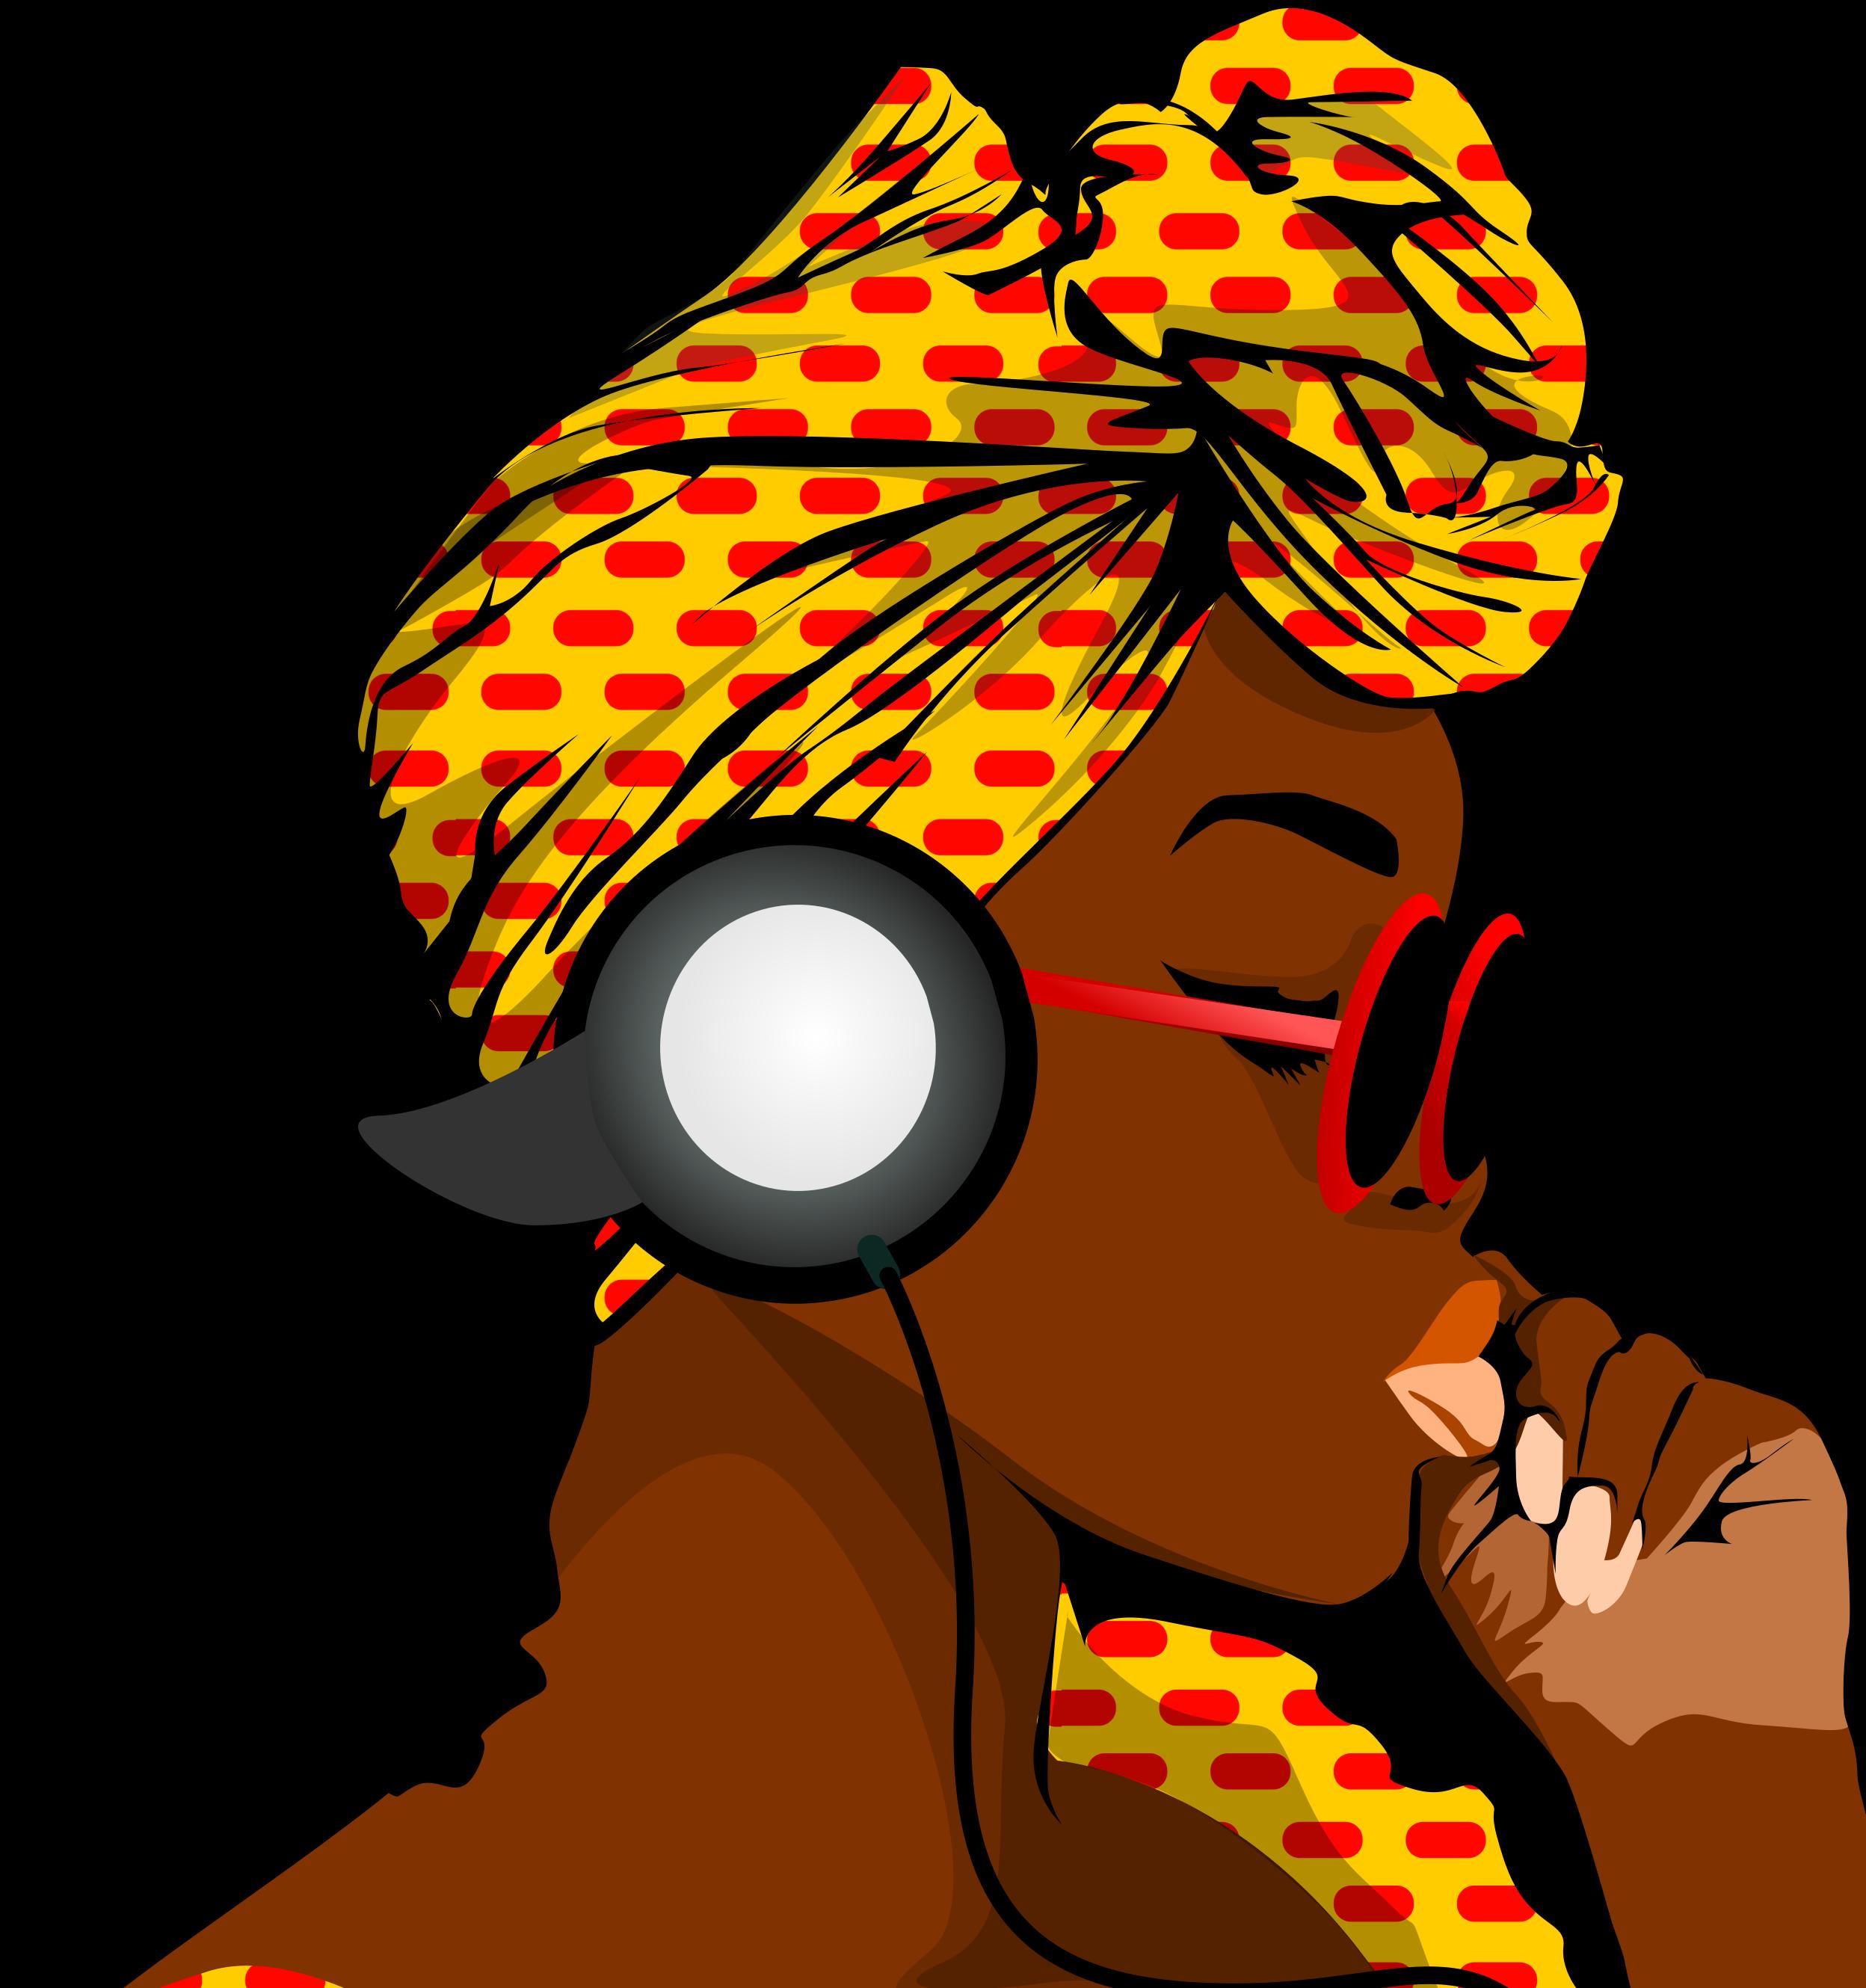 #WakandaForever: How technovation is spurring Africa's media growth